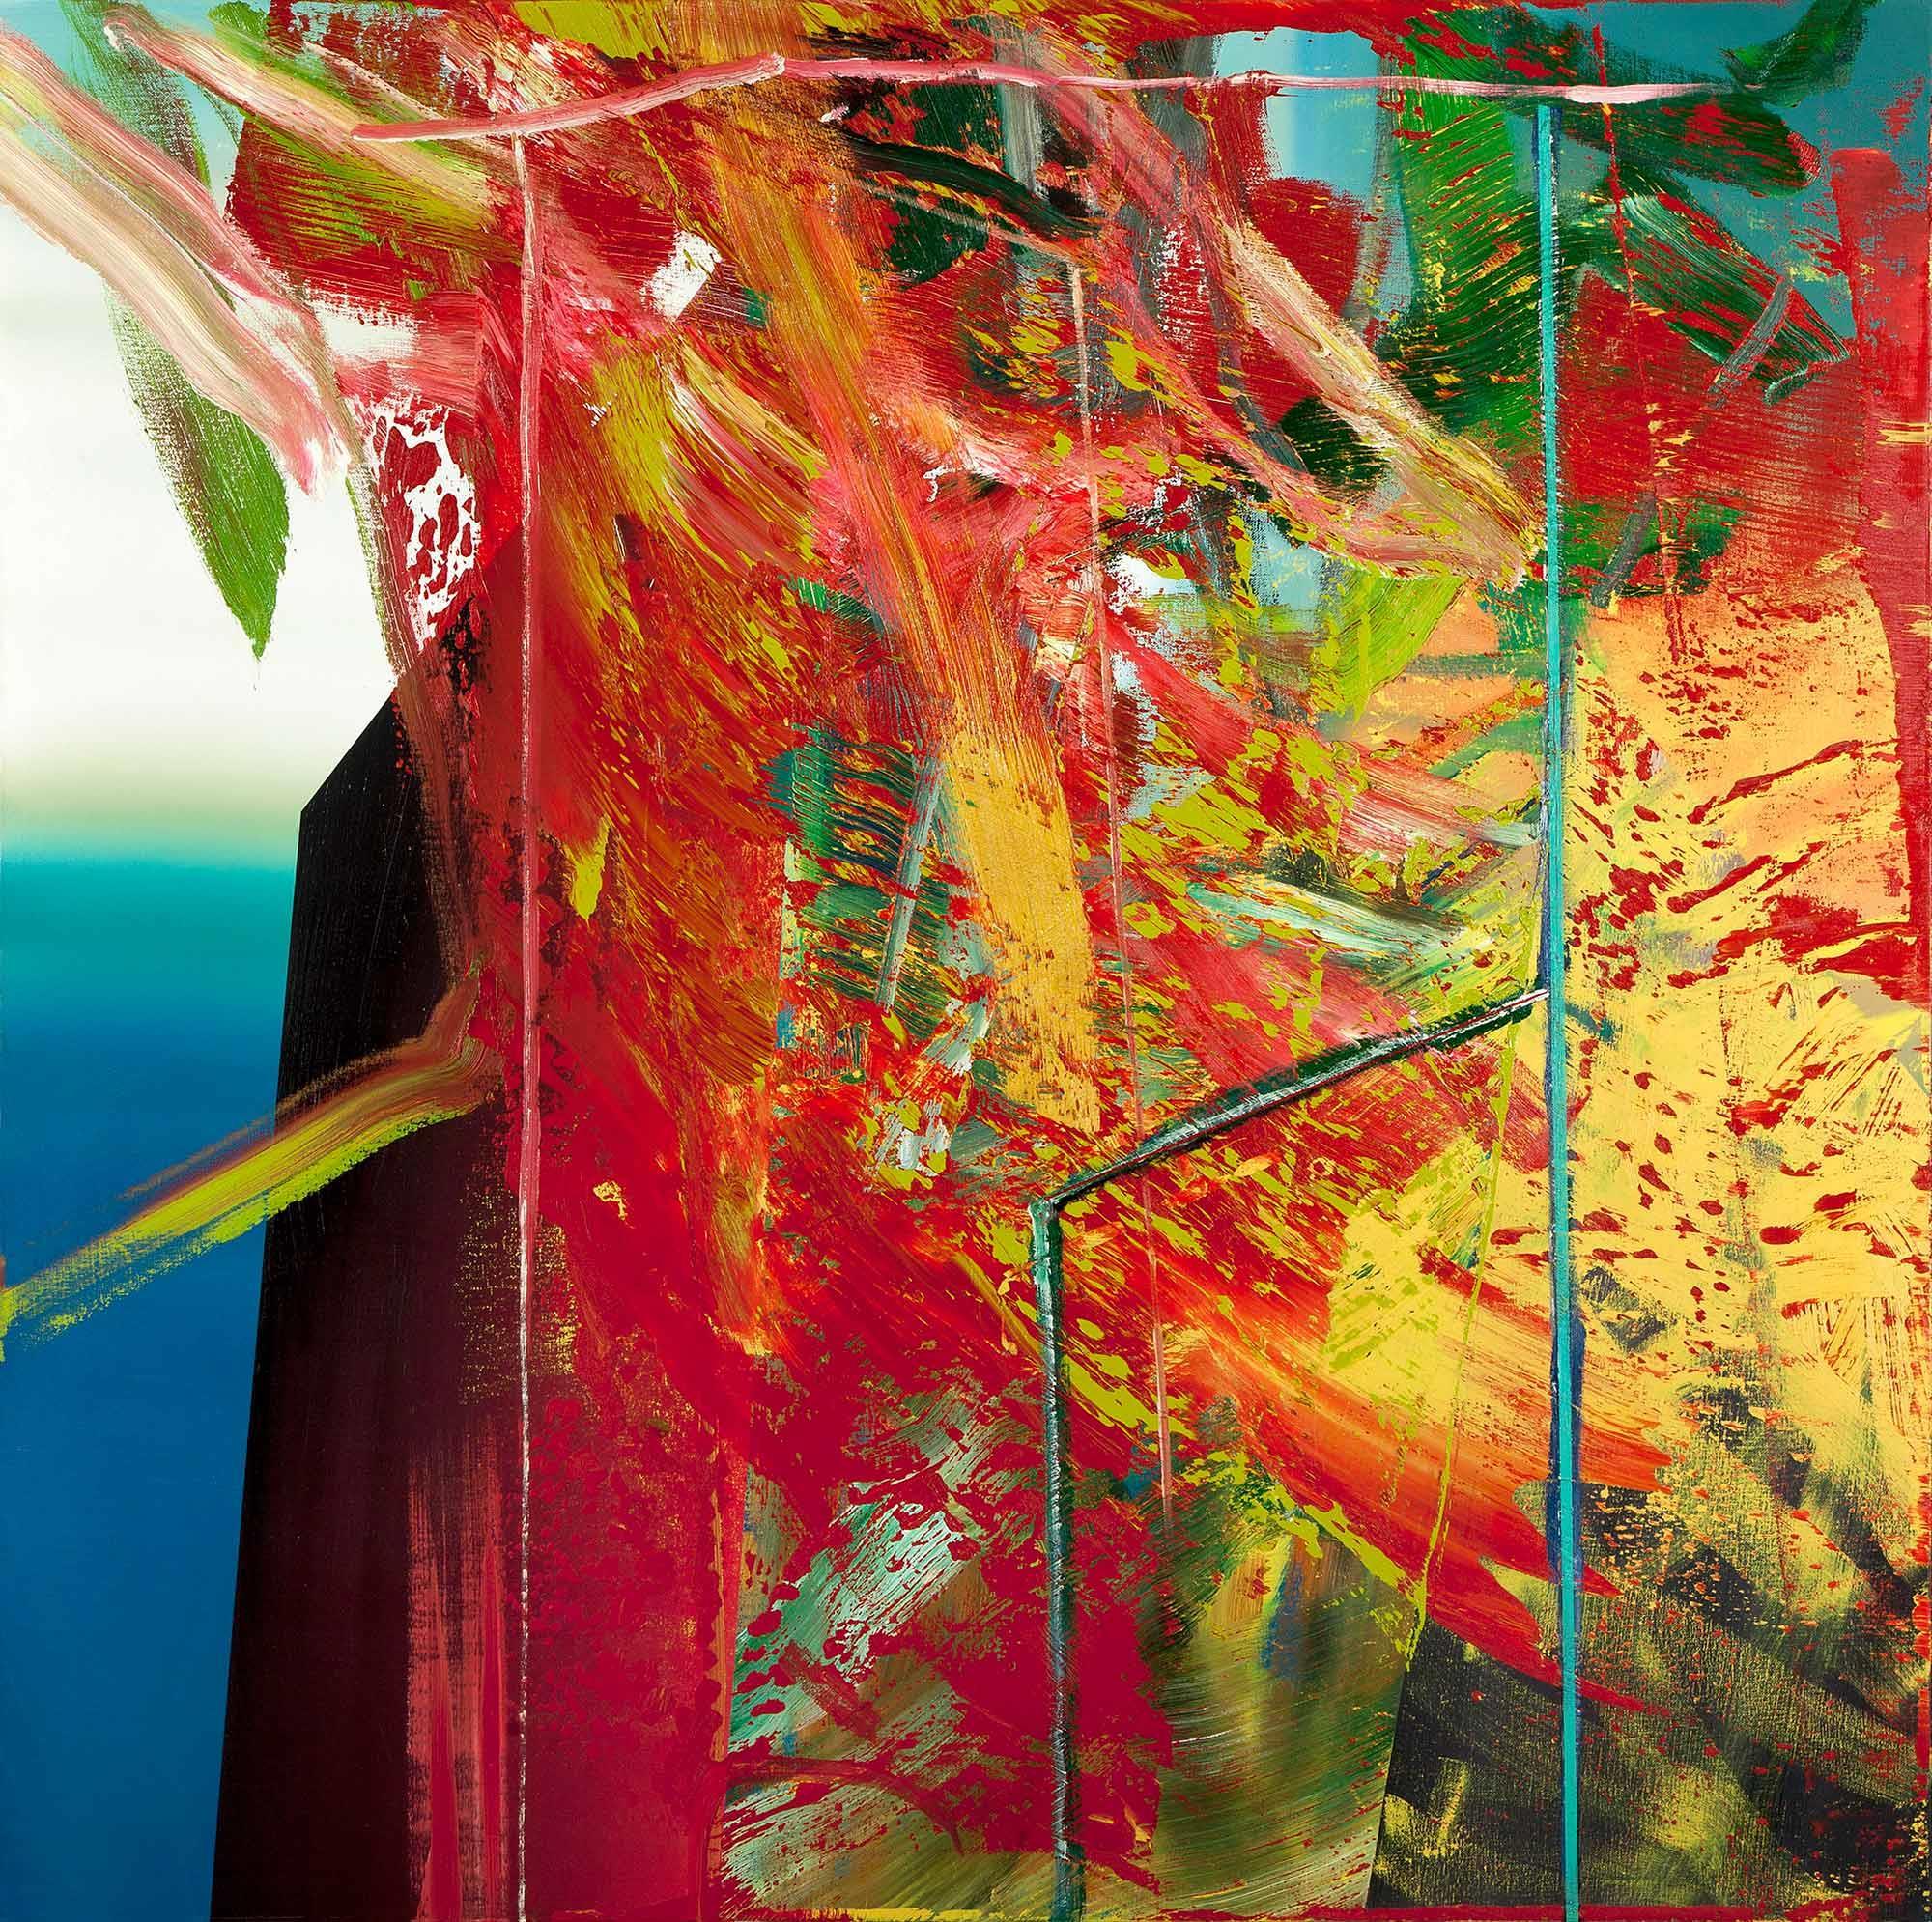 Phillipss 95 Million Gerhard Richter Exhibition  artnet